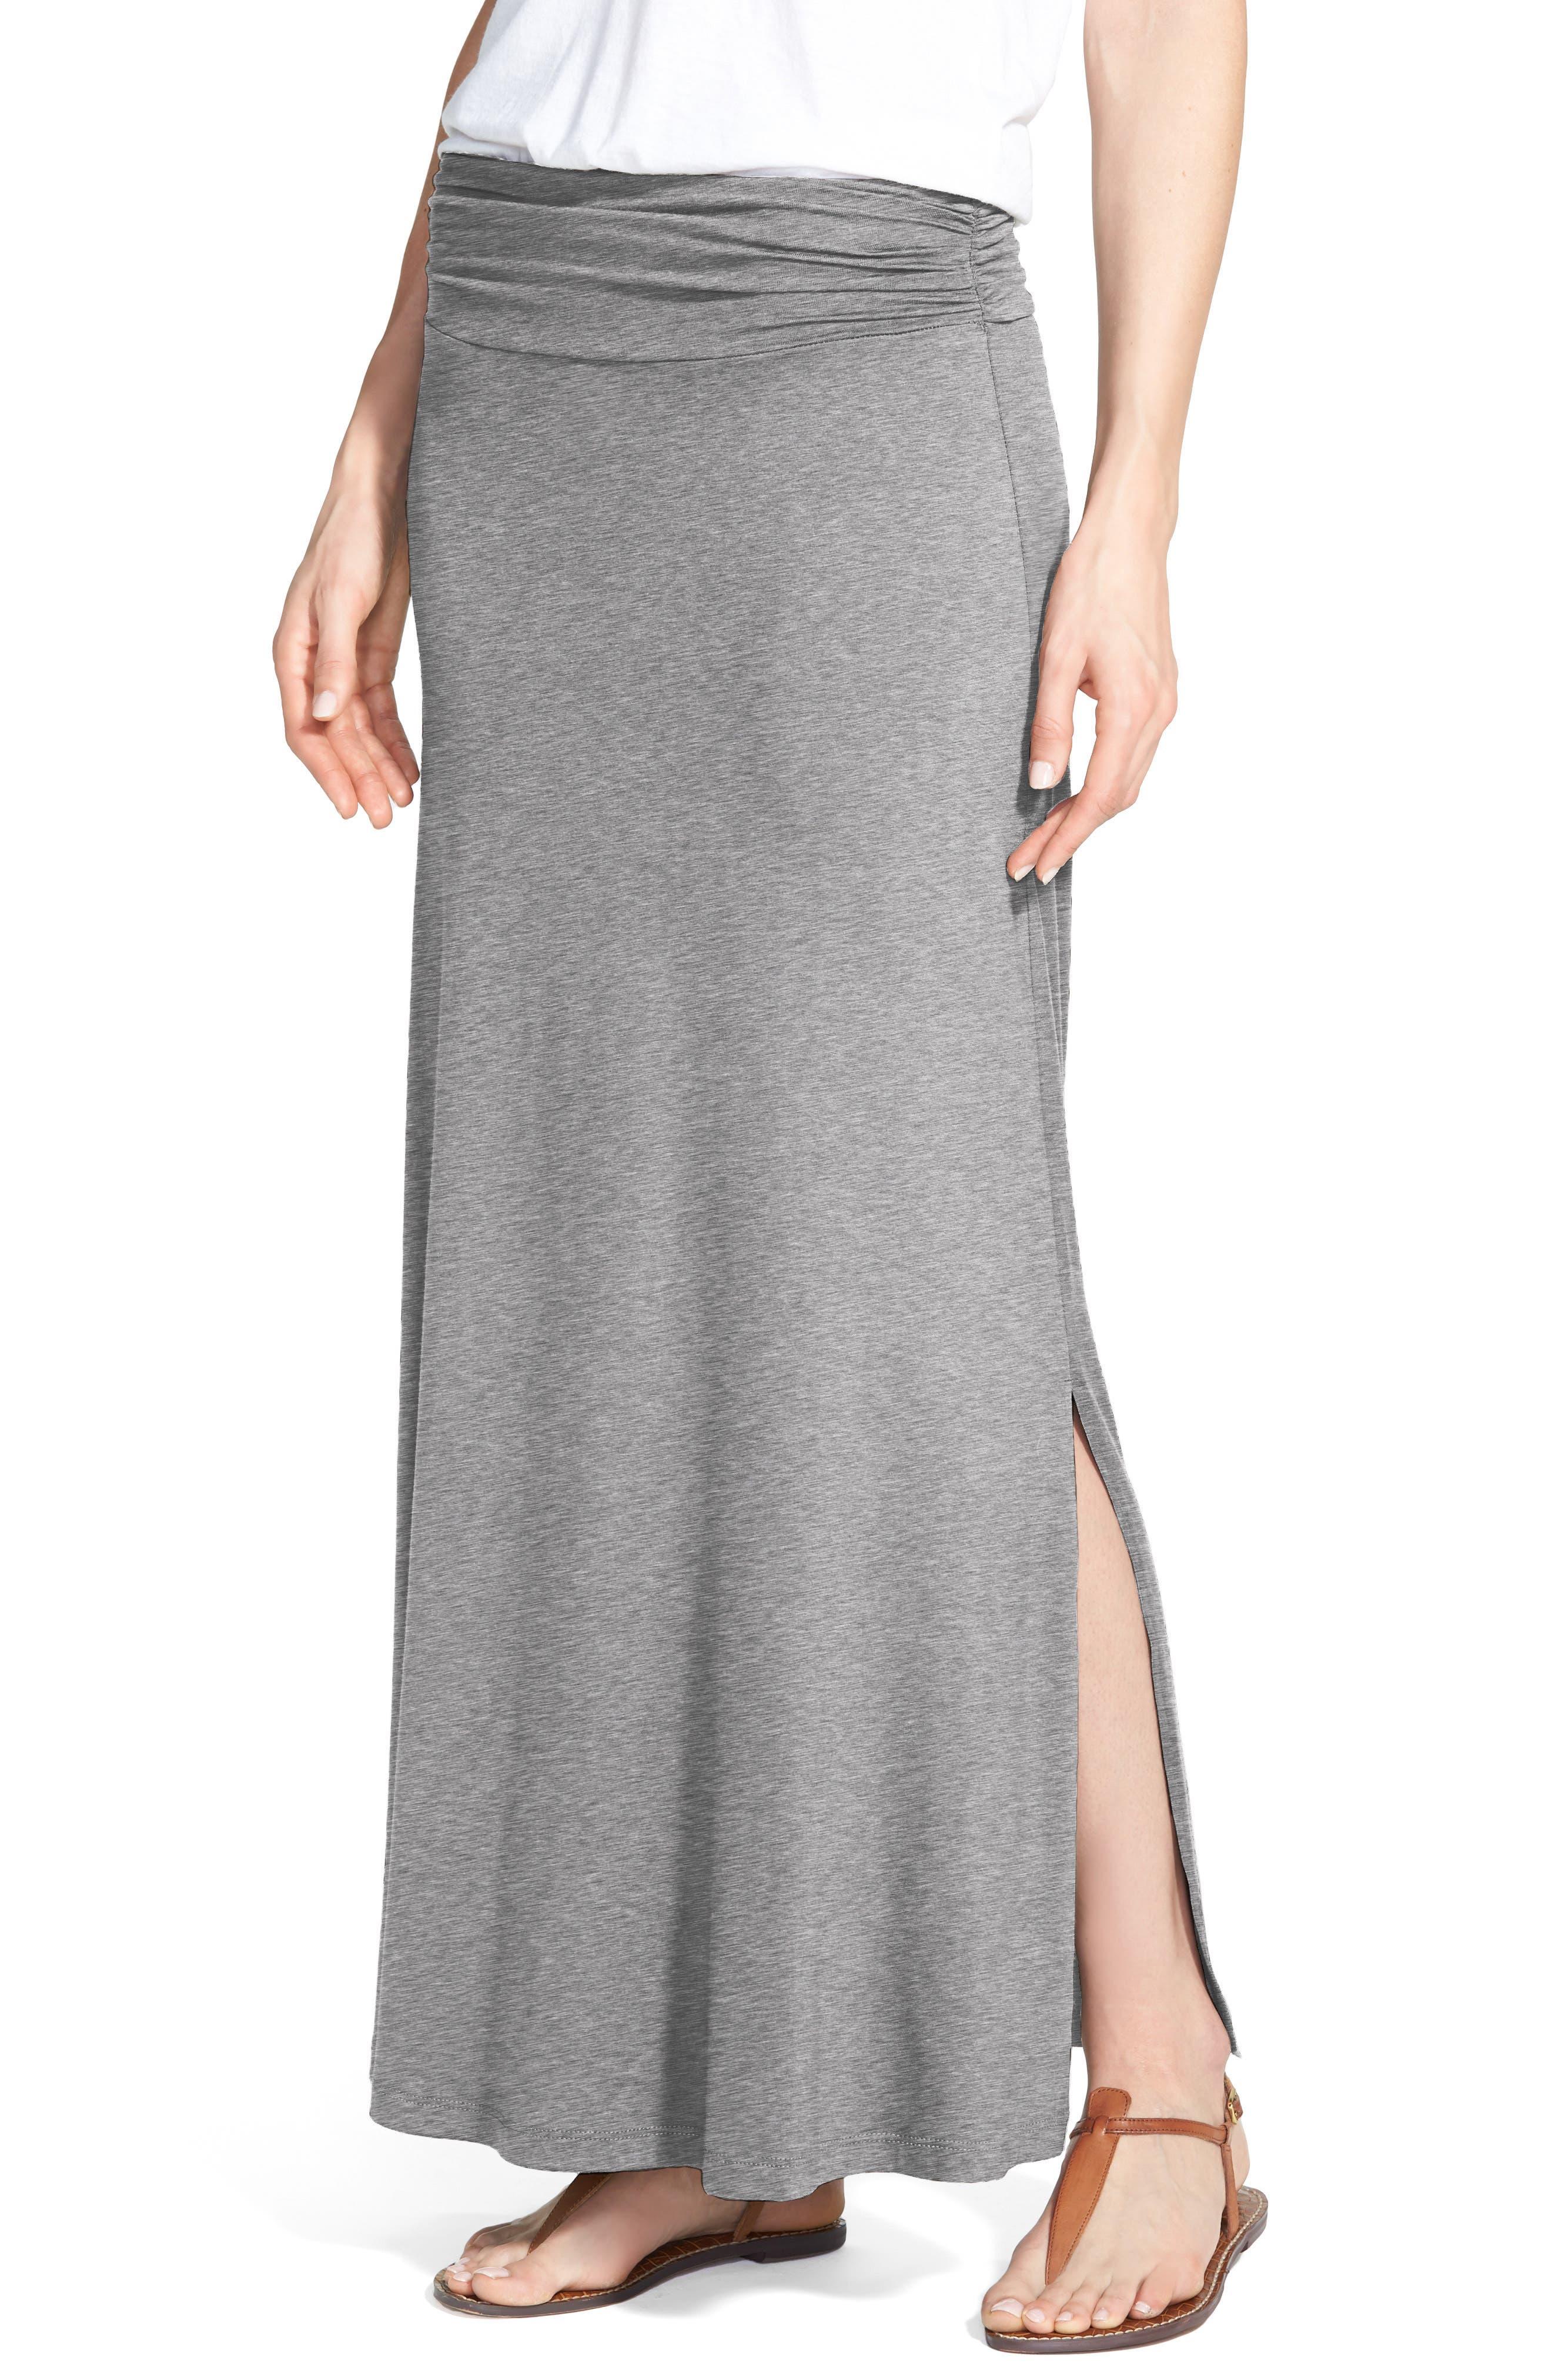 C&C California Womens Wrap Skirt Heather Grey - Skirts